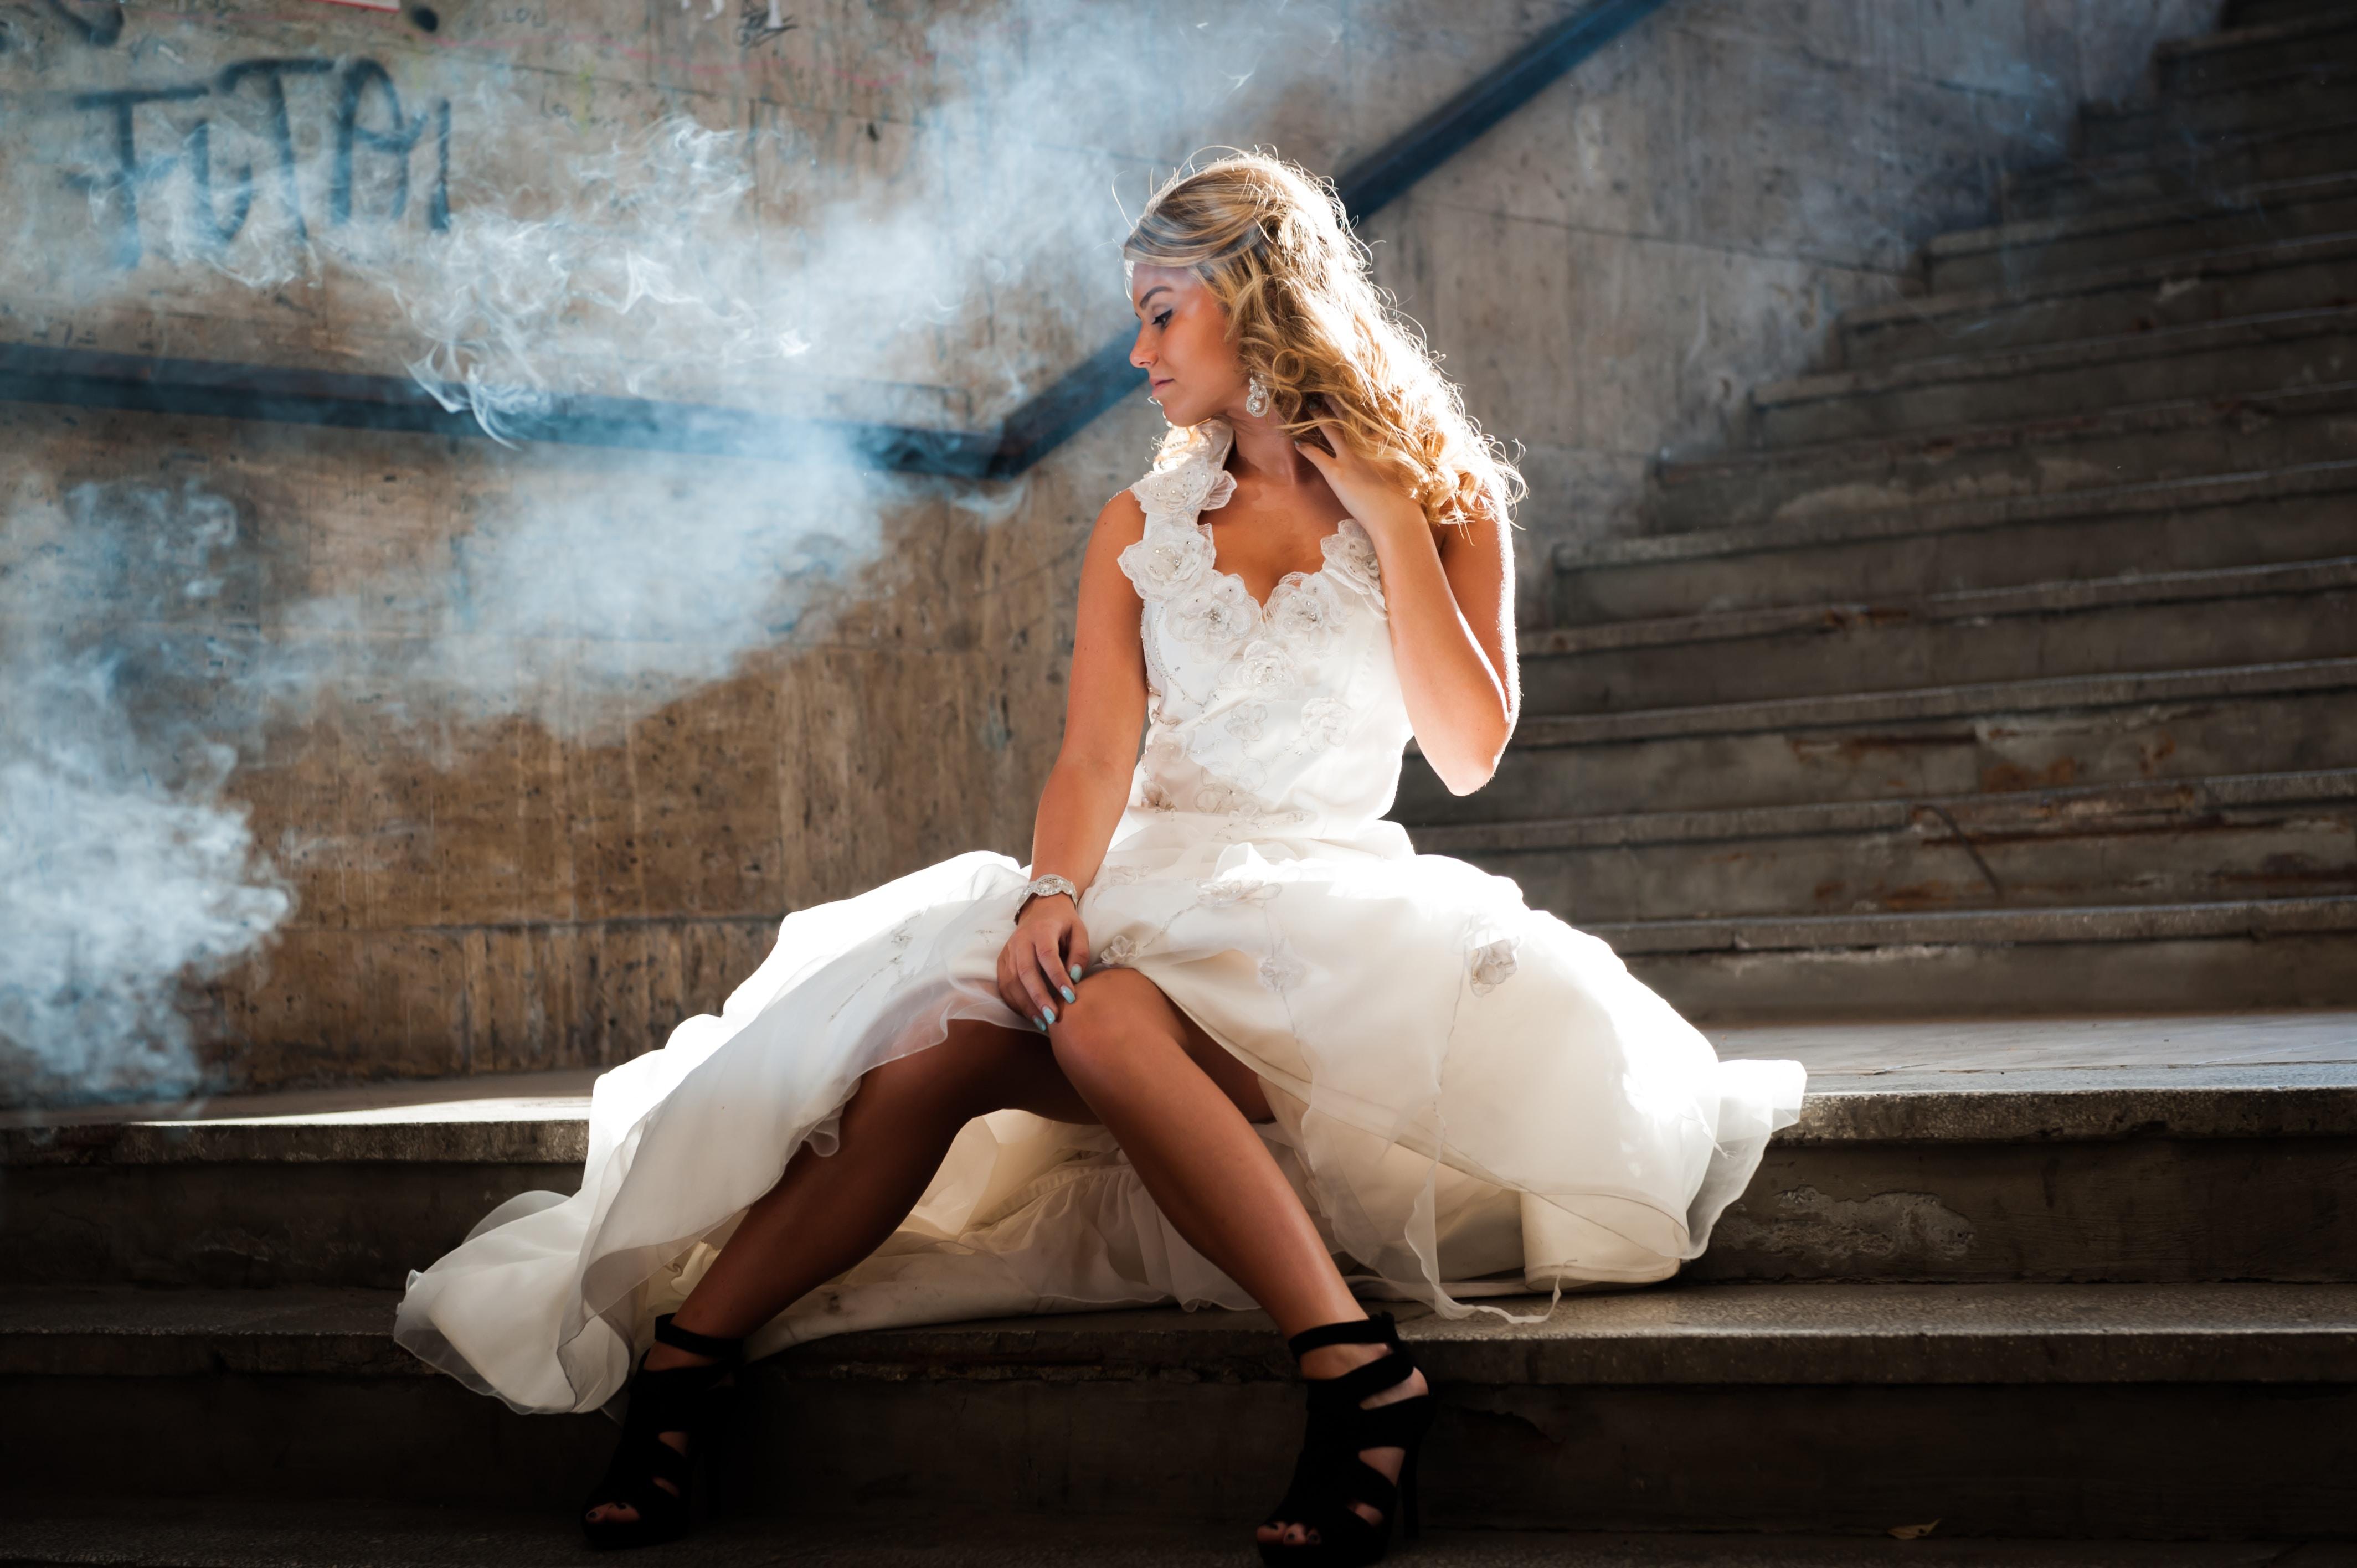 woman wearing white gown sitting on stir